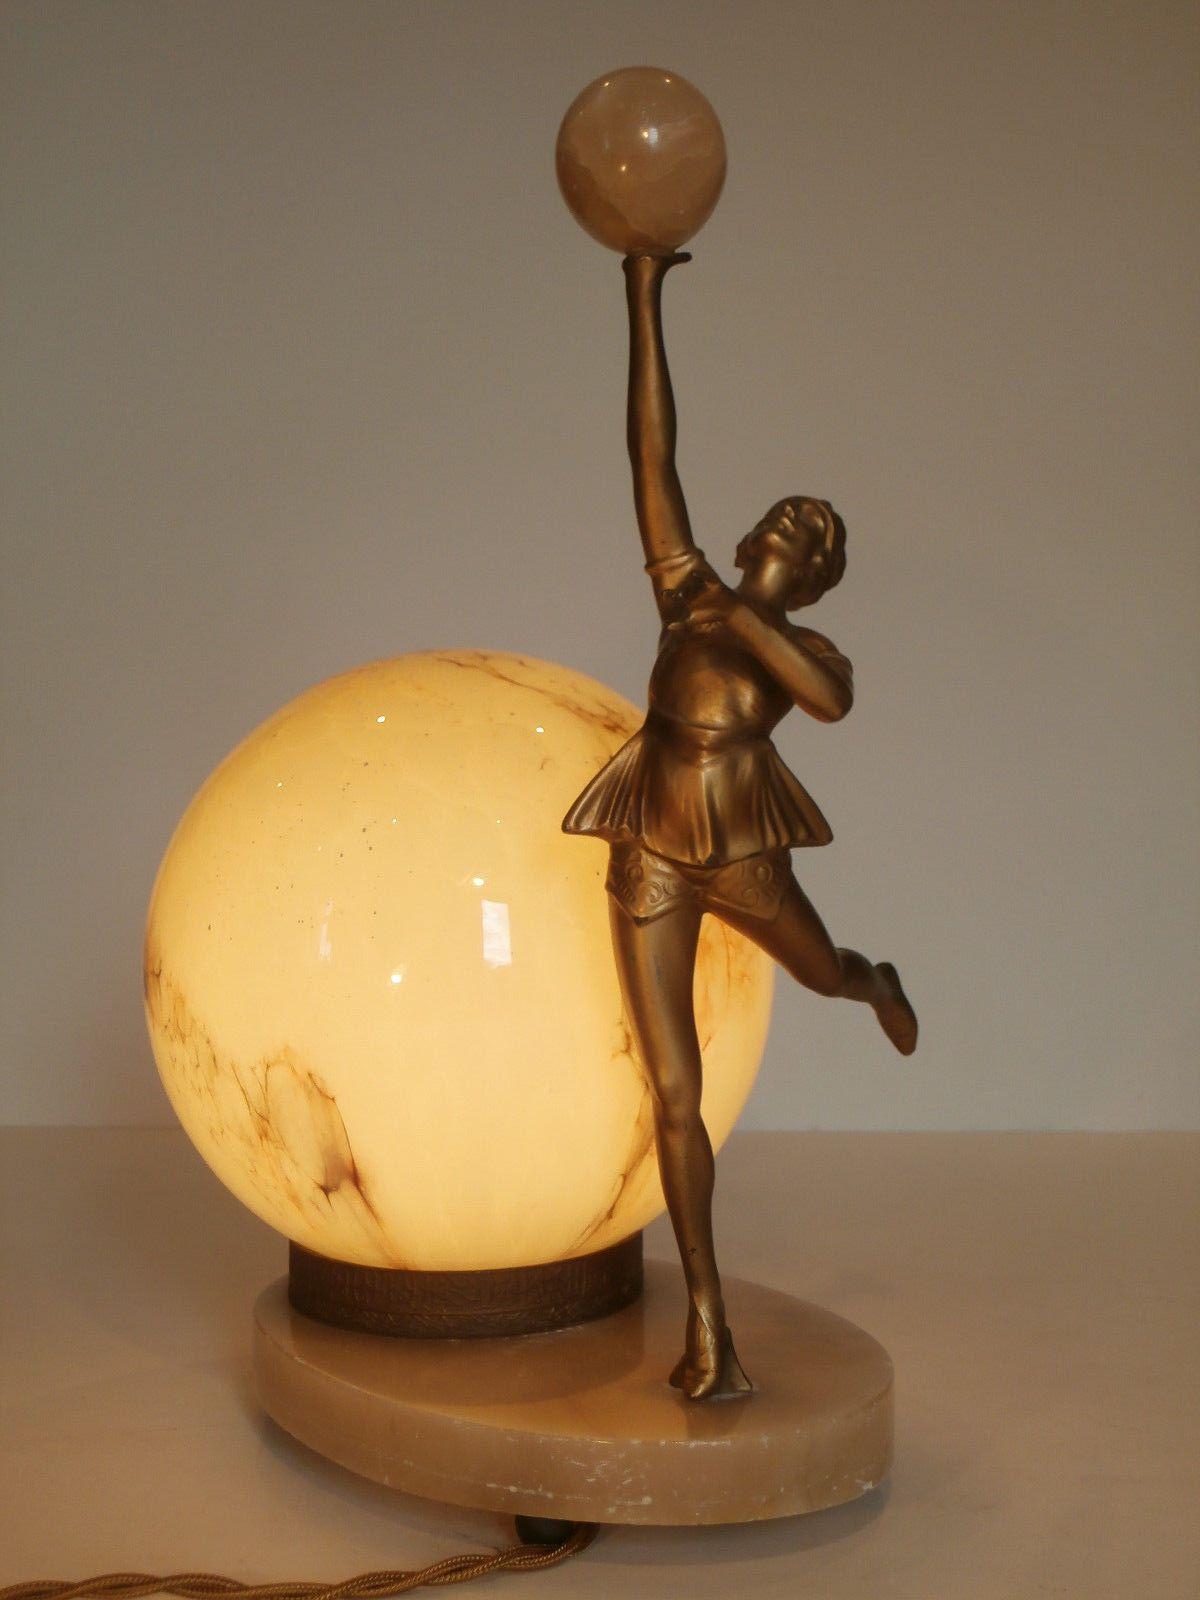 ART DECO ORIGINAL SPELTER LADY LAMP COSTUMED DANCER WITH